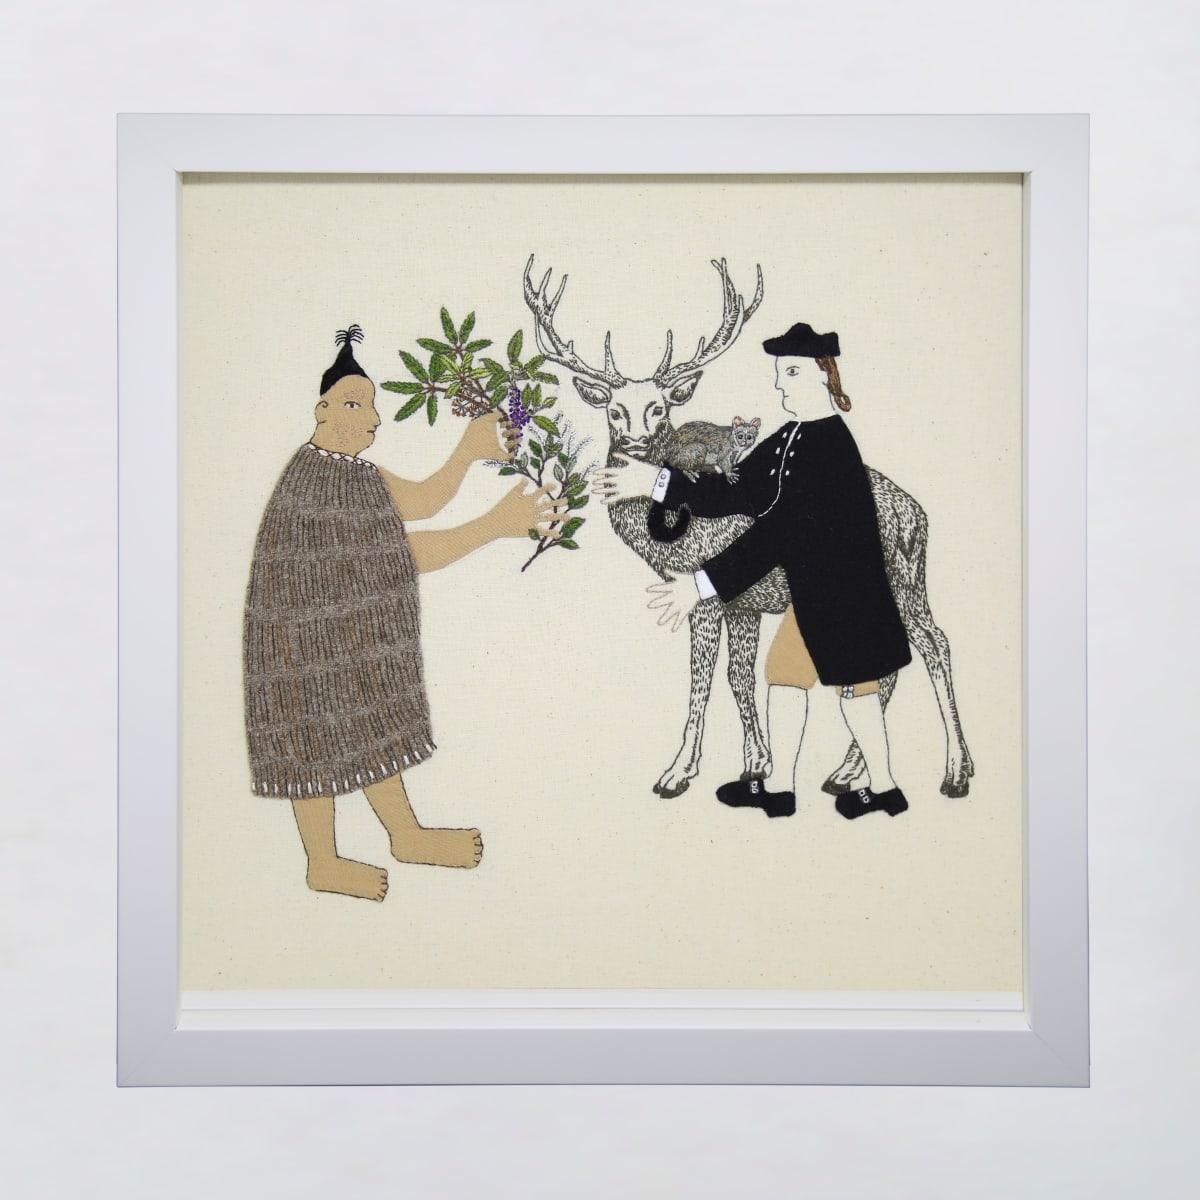 Sarah Munro, Trade Items - Understorey, Possum, Deer, 2019